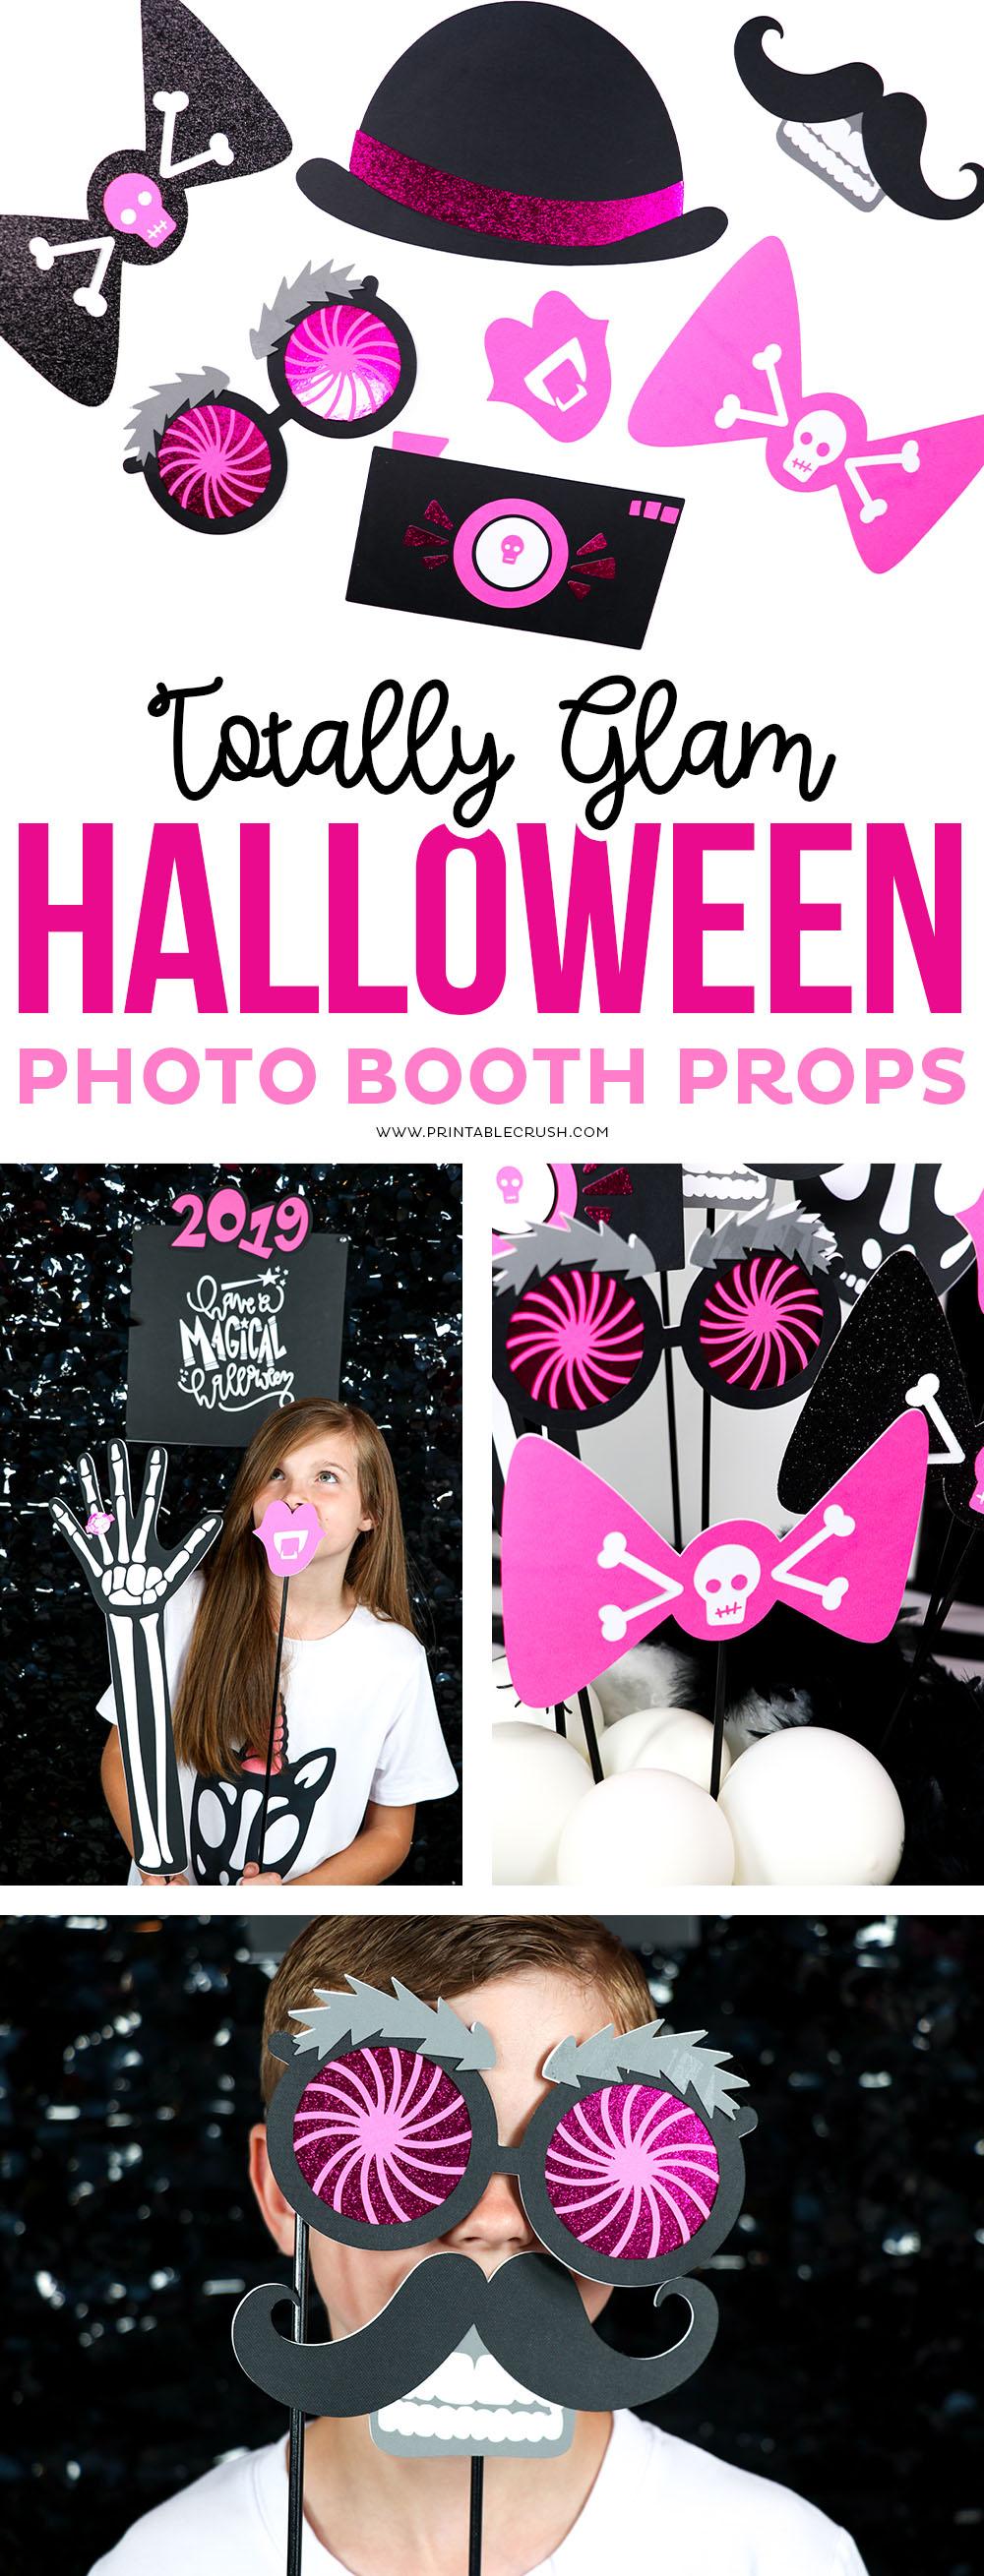 Glam Halloween Photo Props